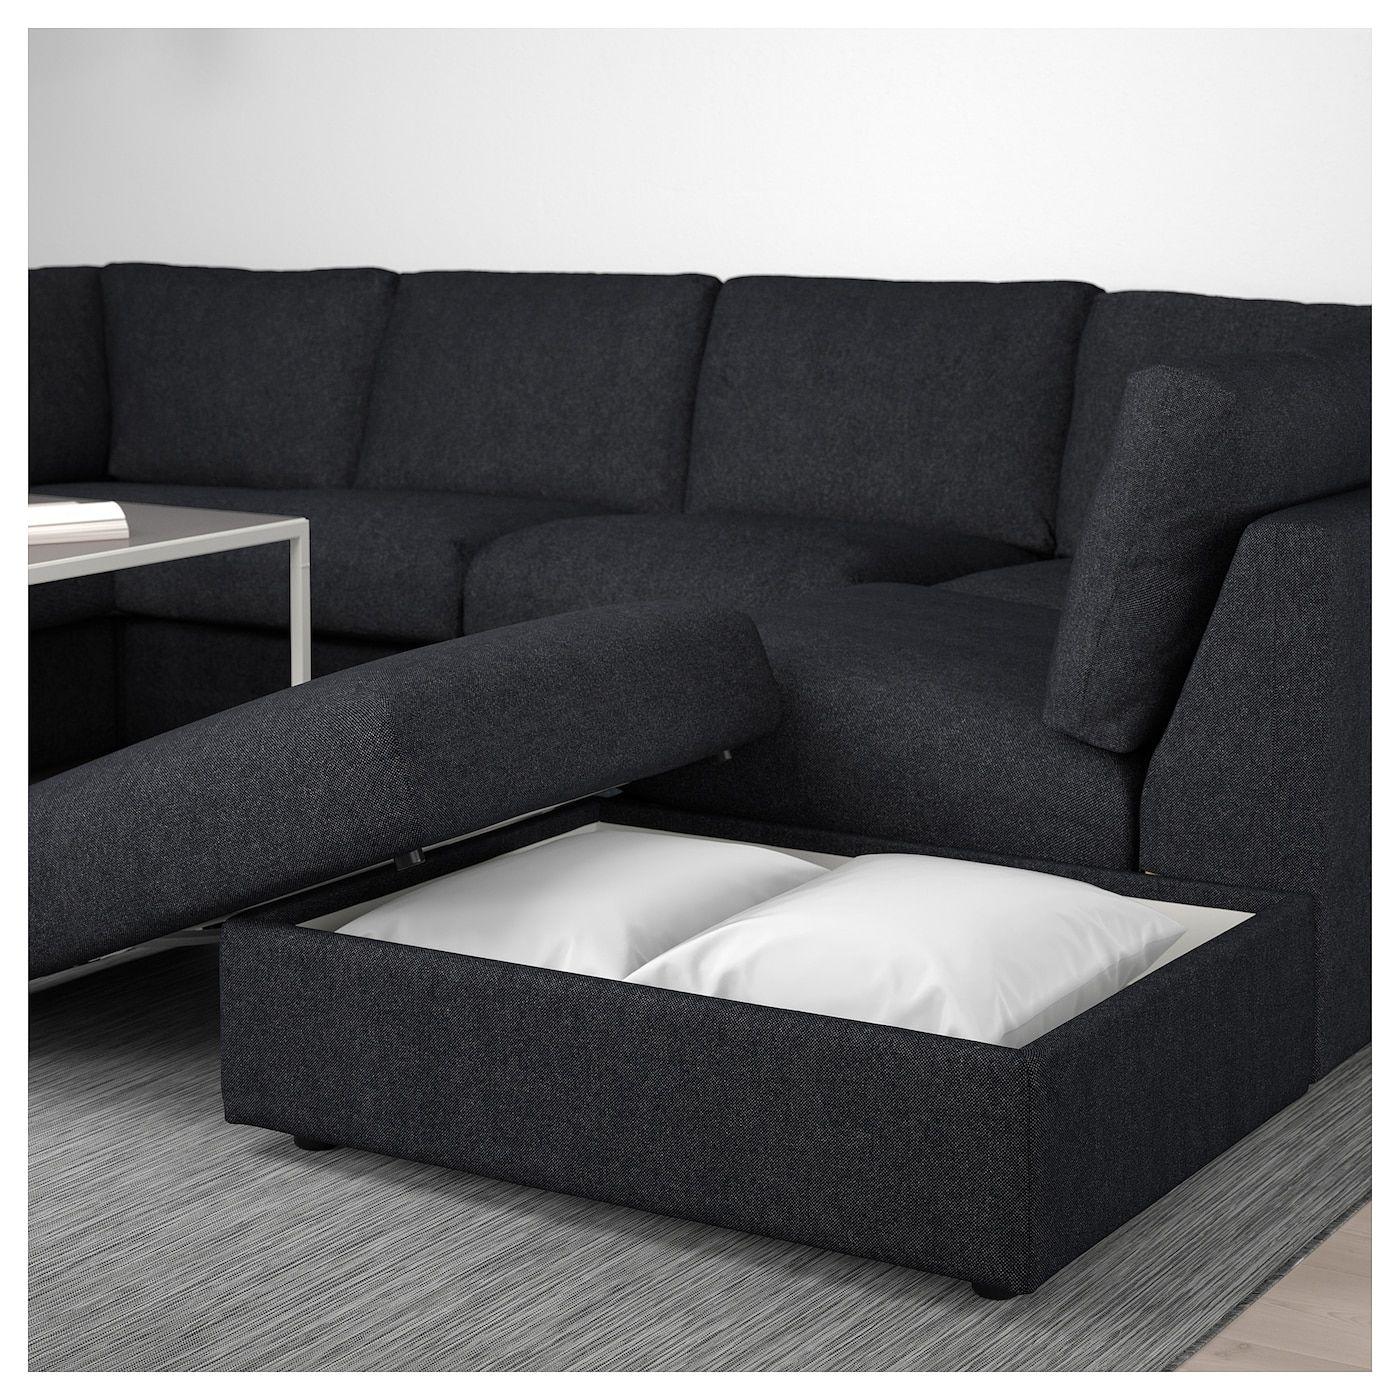 Vimle Sofa U Form 6 Sitzig Ohne Abschluss Tallmyra Schwarz Grau Modulares Ecksofa Sofa Sofa U Form